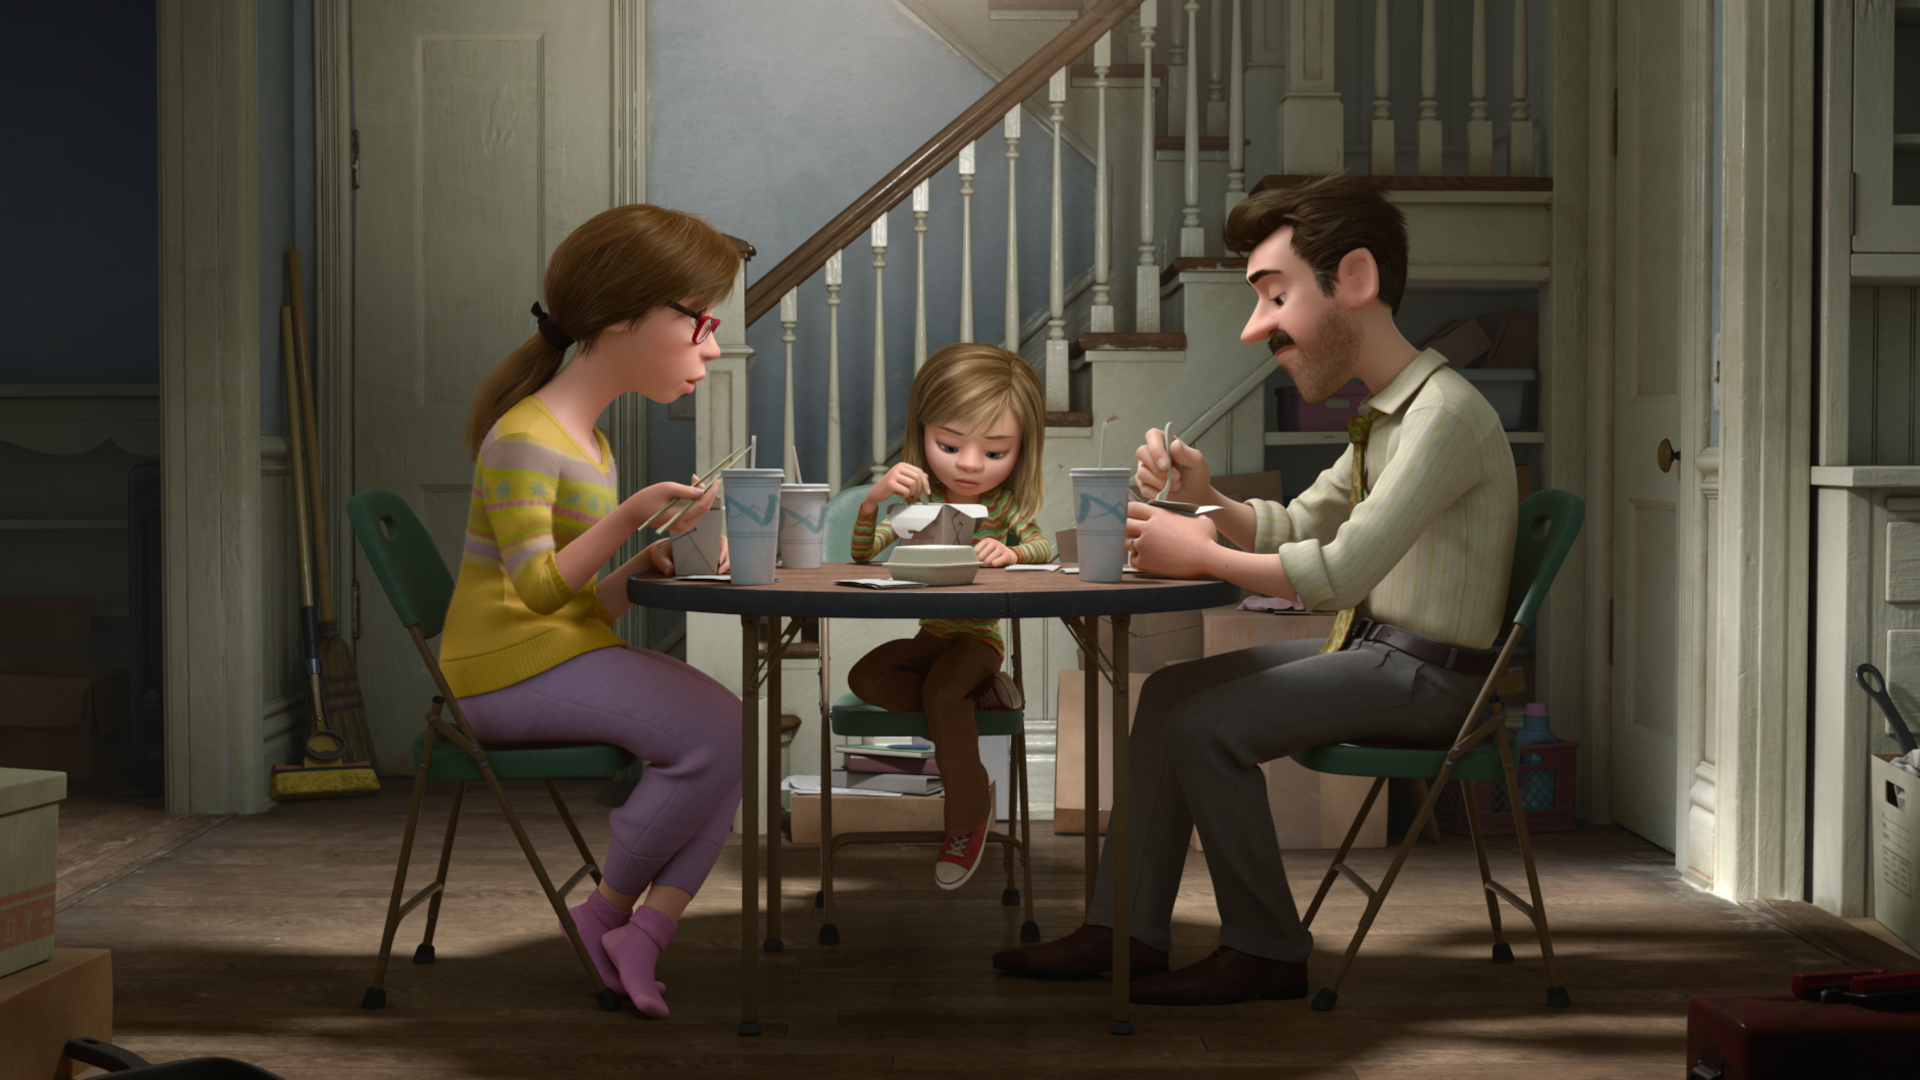 http://vignette4.wikia.nocookie.net/pixar/images/4/40/Inside-Out-Trailer-Pull-RGB-d335_1cs.pub16.264.jpg/revision/latest?cb=20141213201724